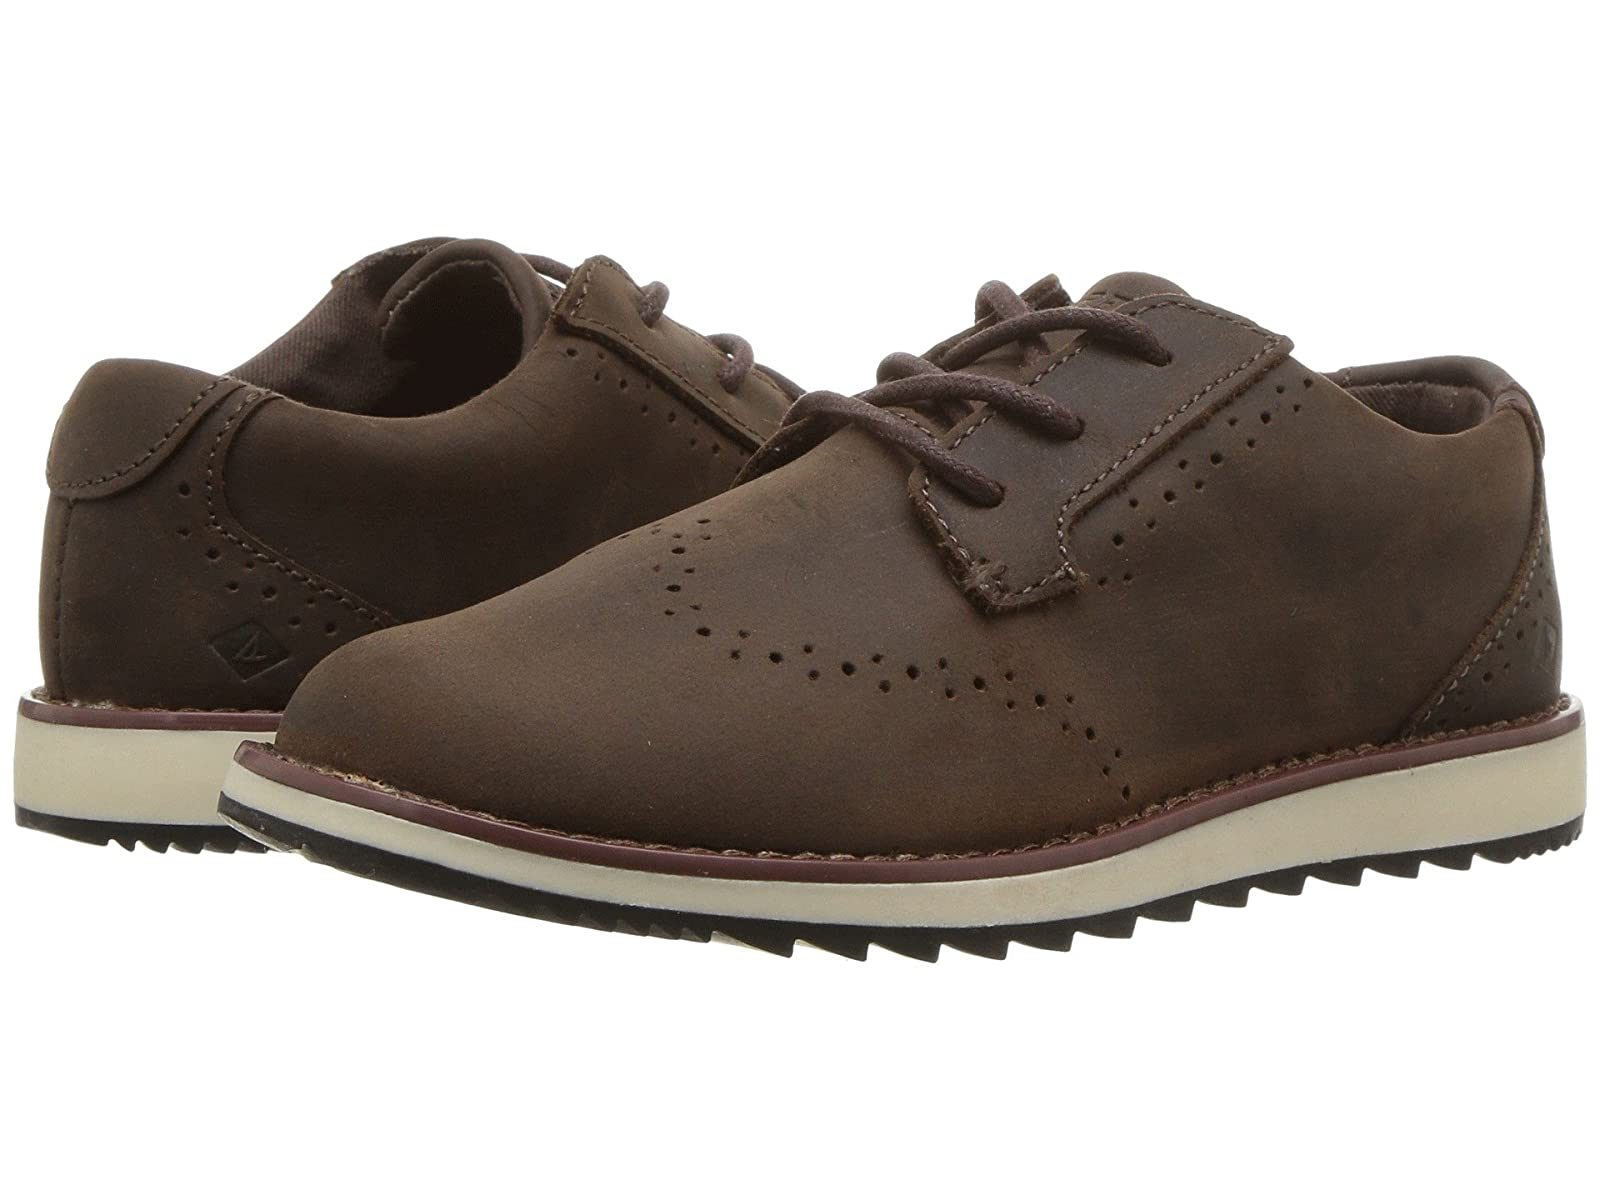 Sperry Kids Windward (Little Kid/Big Kid)Atmospheric grades have affordable shoes